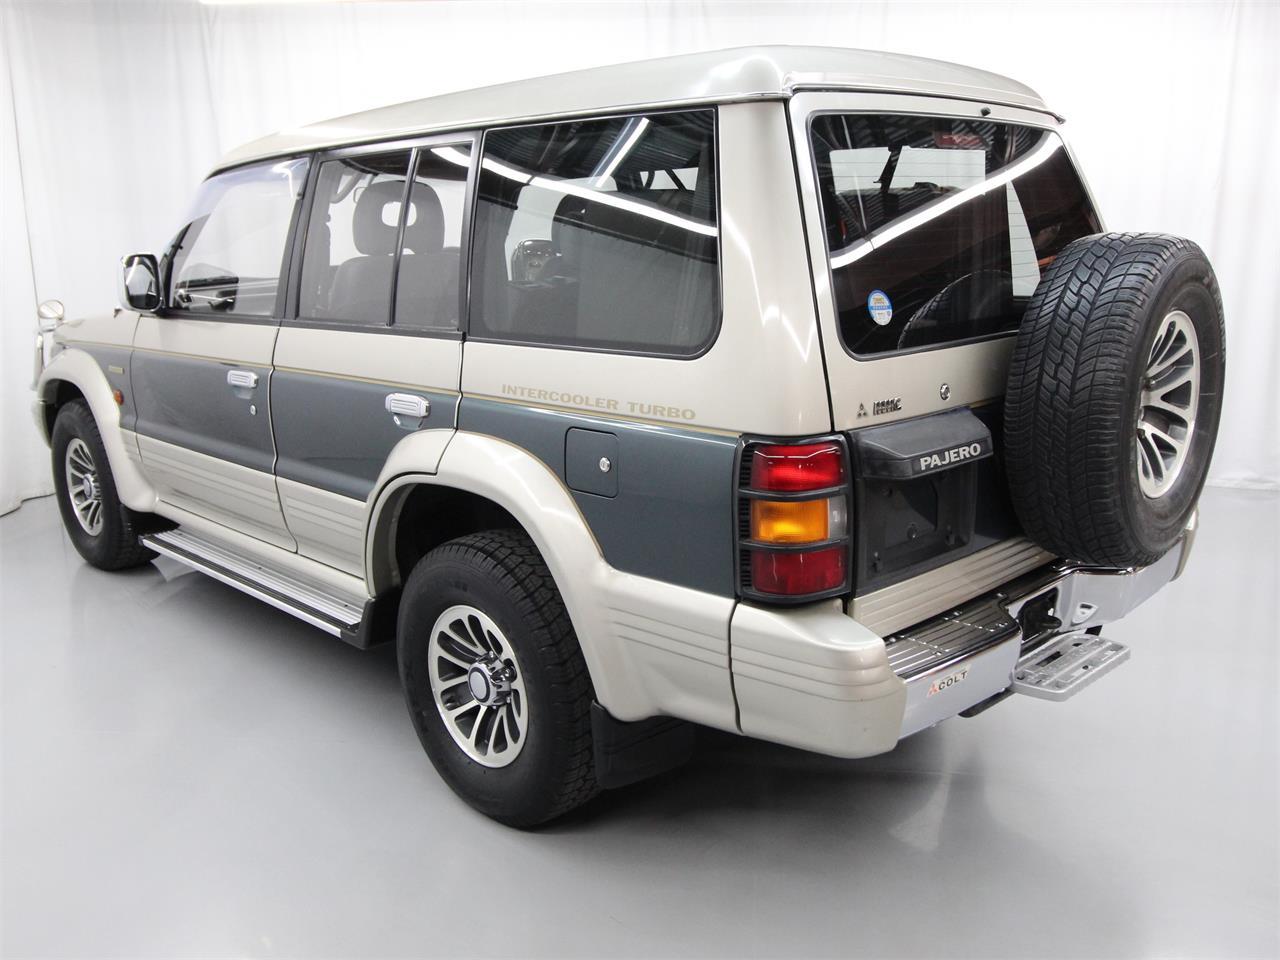 1992 Mitsubishi Pajero (CC-1344646) for sale in Christiansburg, Virginia